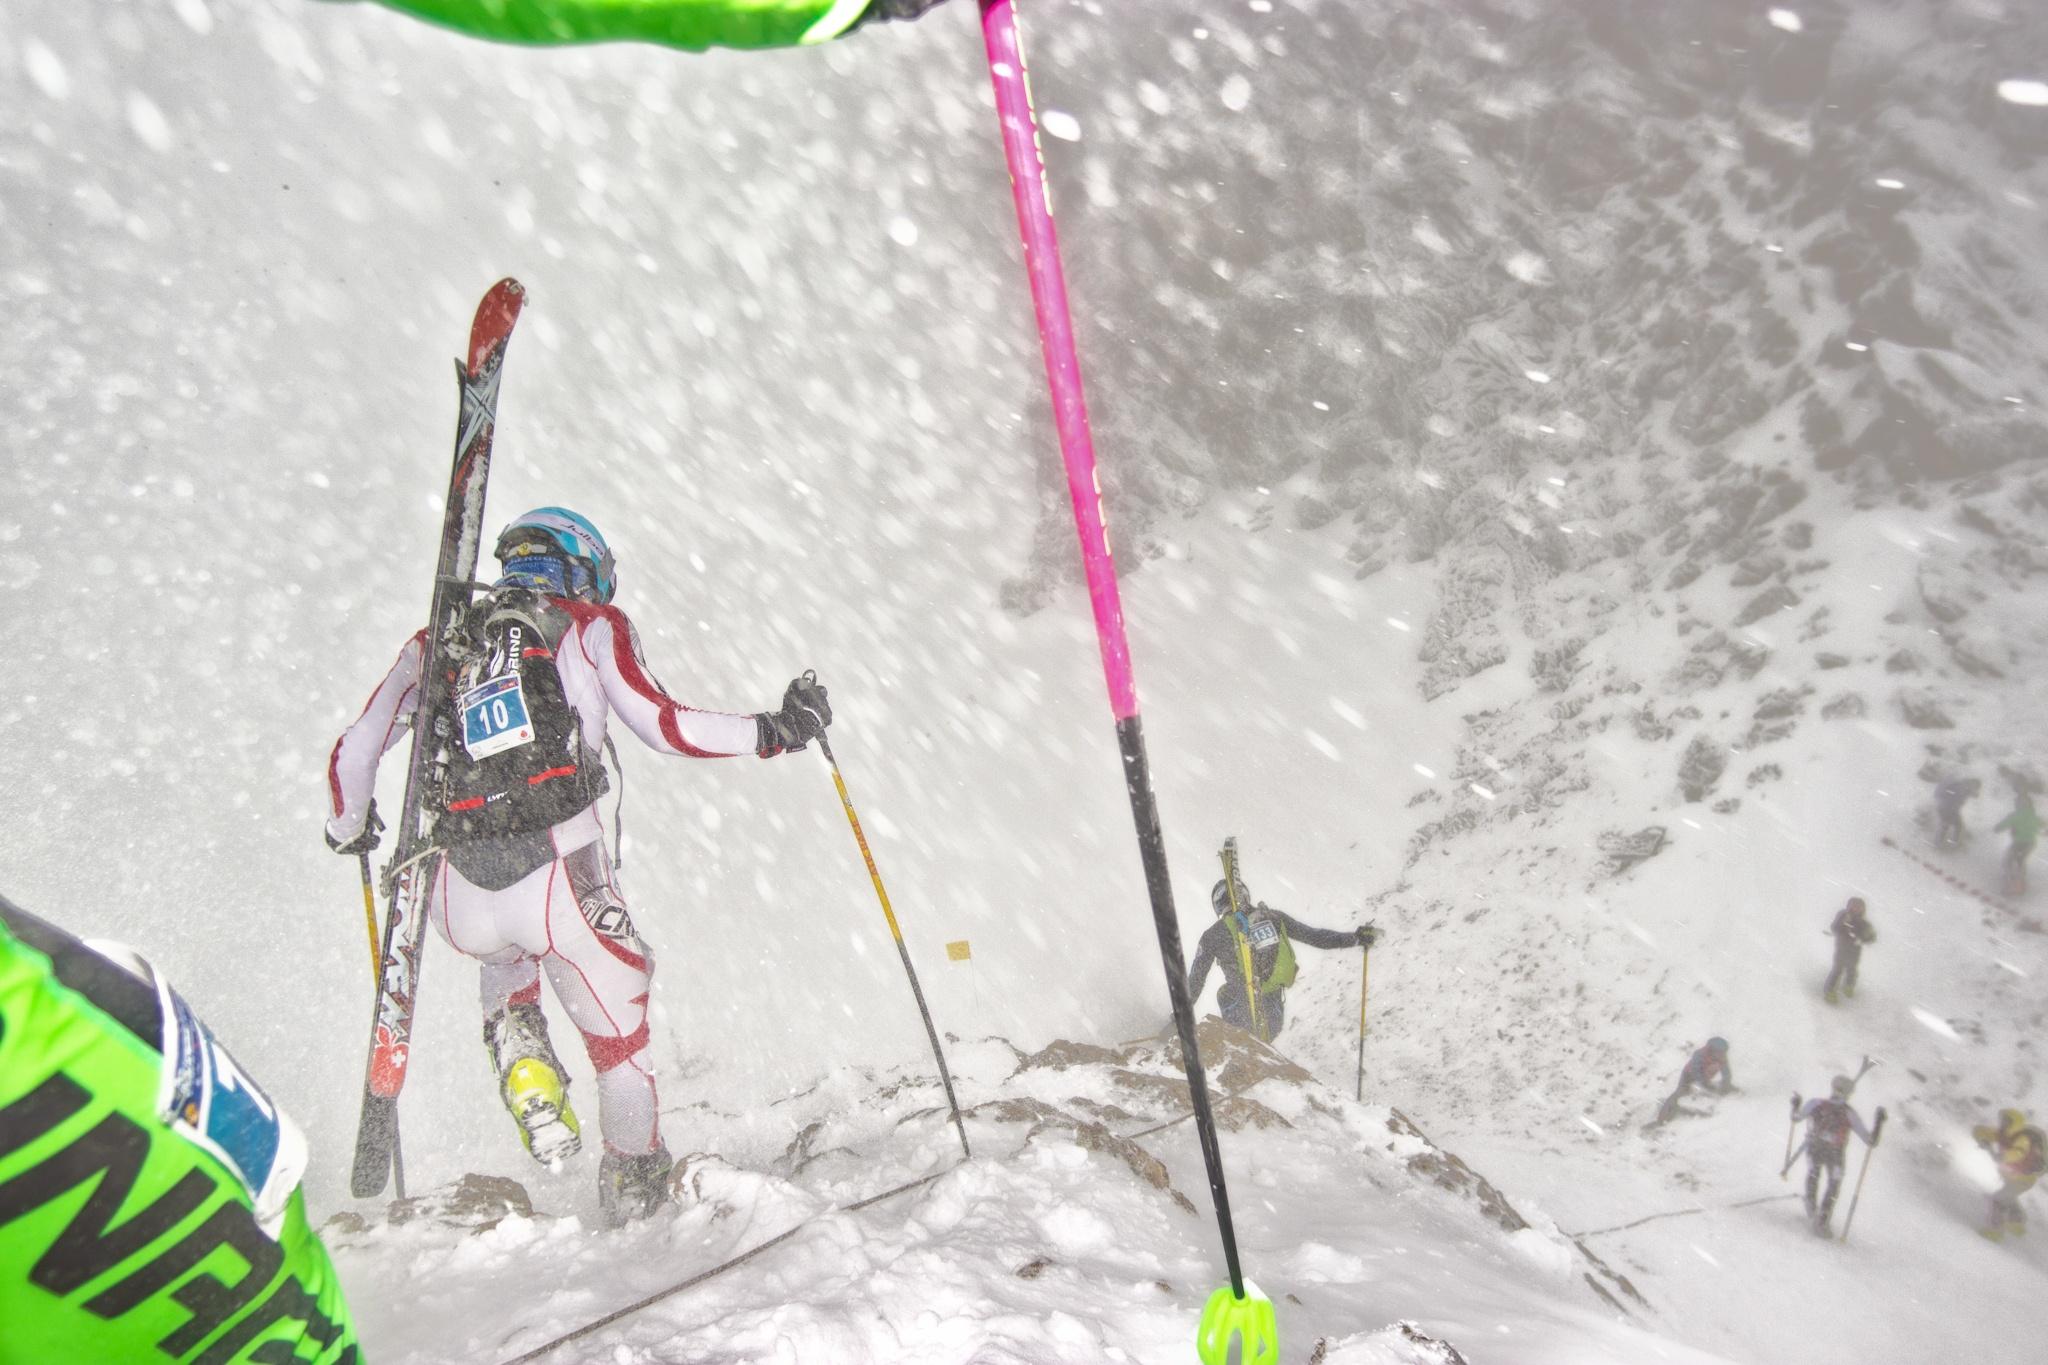 Causiat Extreme 2018 - Ski & Snowboard - Fotos del Valle del Aragón, Mikel Besga